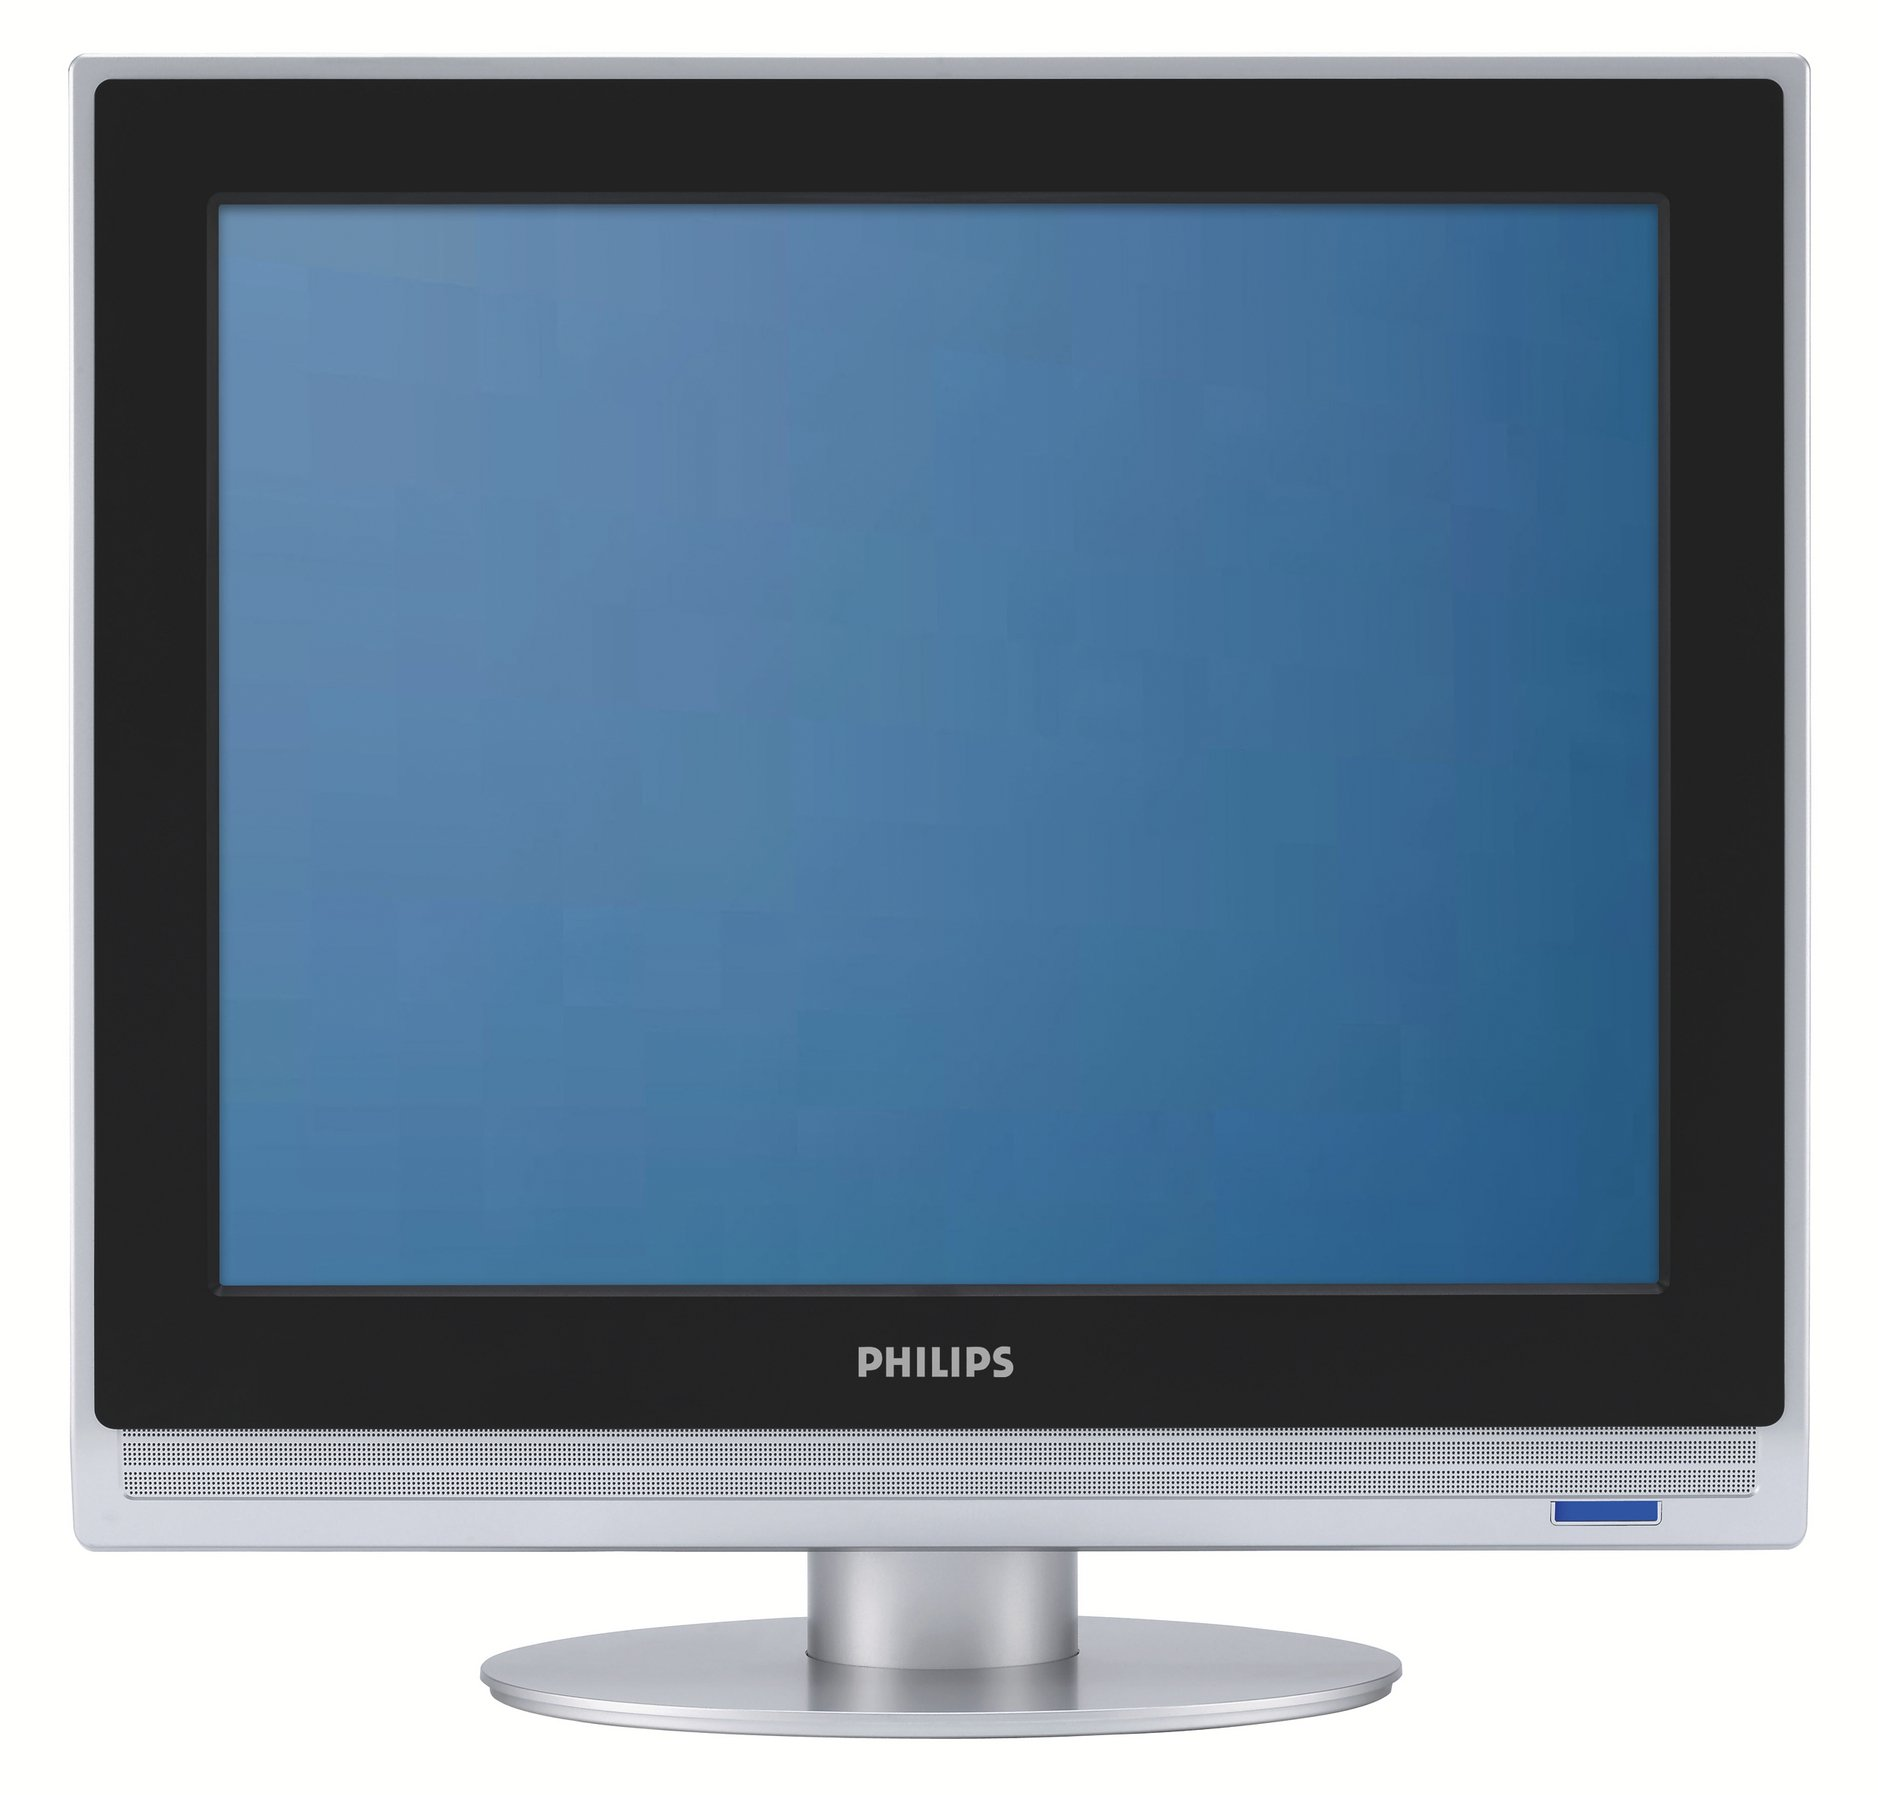 Philips 20PFL4122 - Televisión, Pantalla LCD 20 pulgadas: Amazon ...